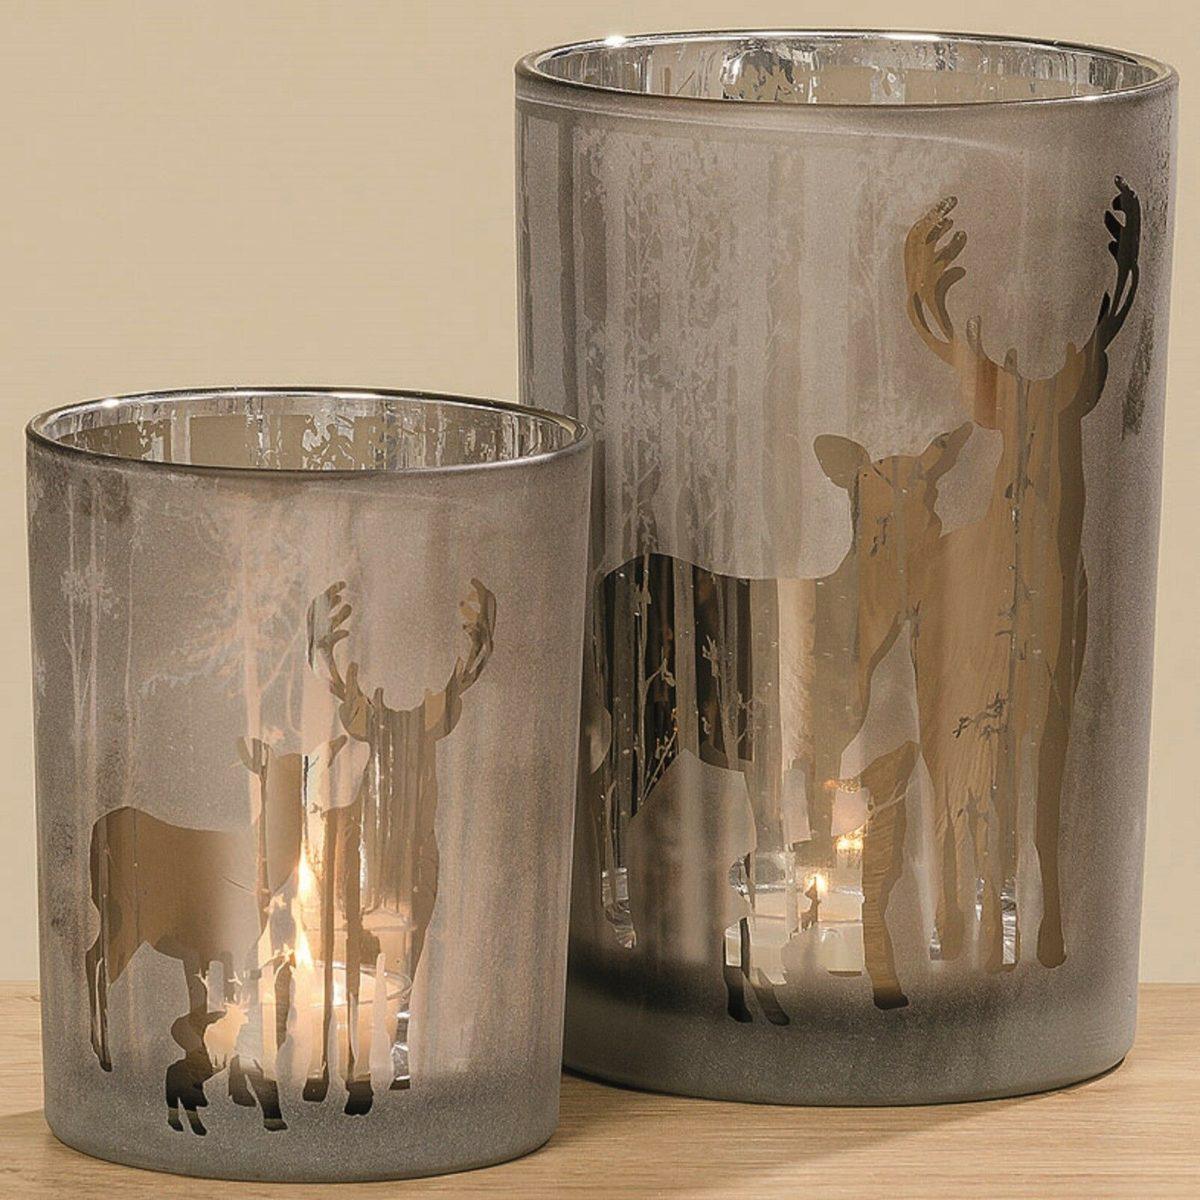 Windlicht Glas lackiert Motiv Hirsch Reh H 12 1200x1200 - Suport pentru lumânări SULANO mic (1010063)